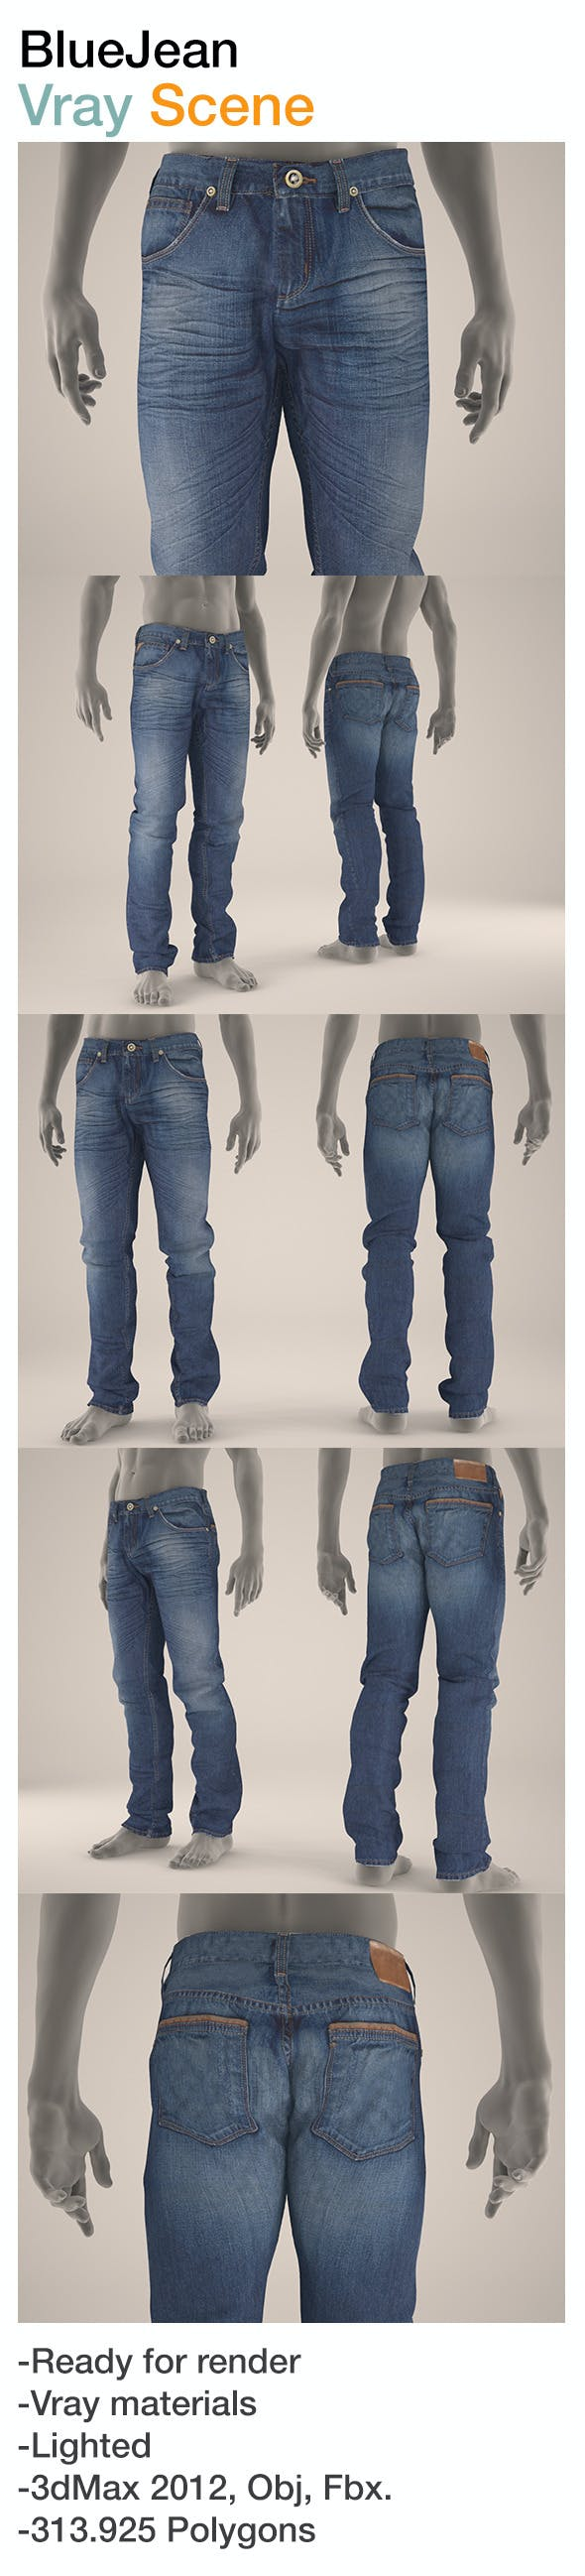 Blue Jean - 3DOcean Item for Sale